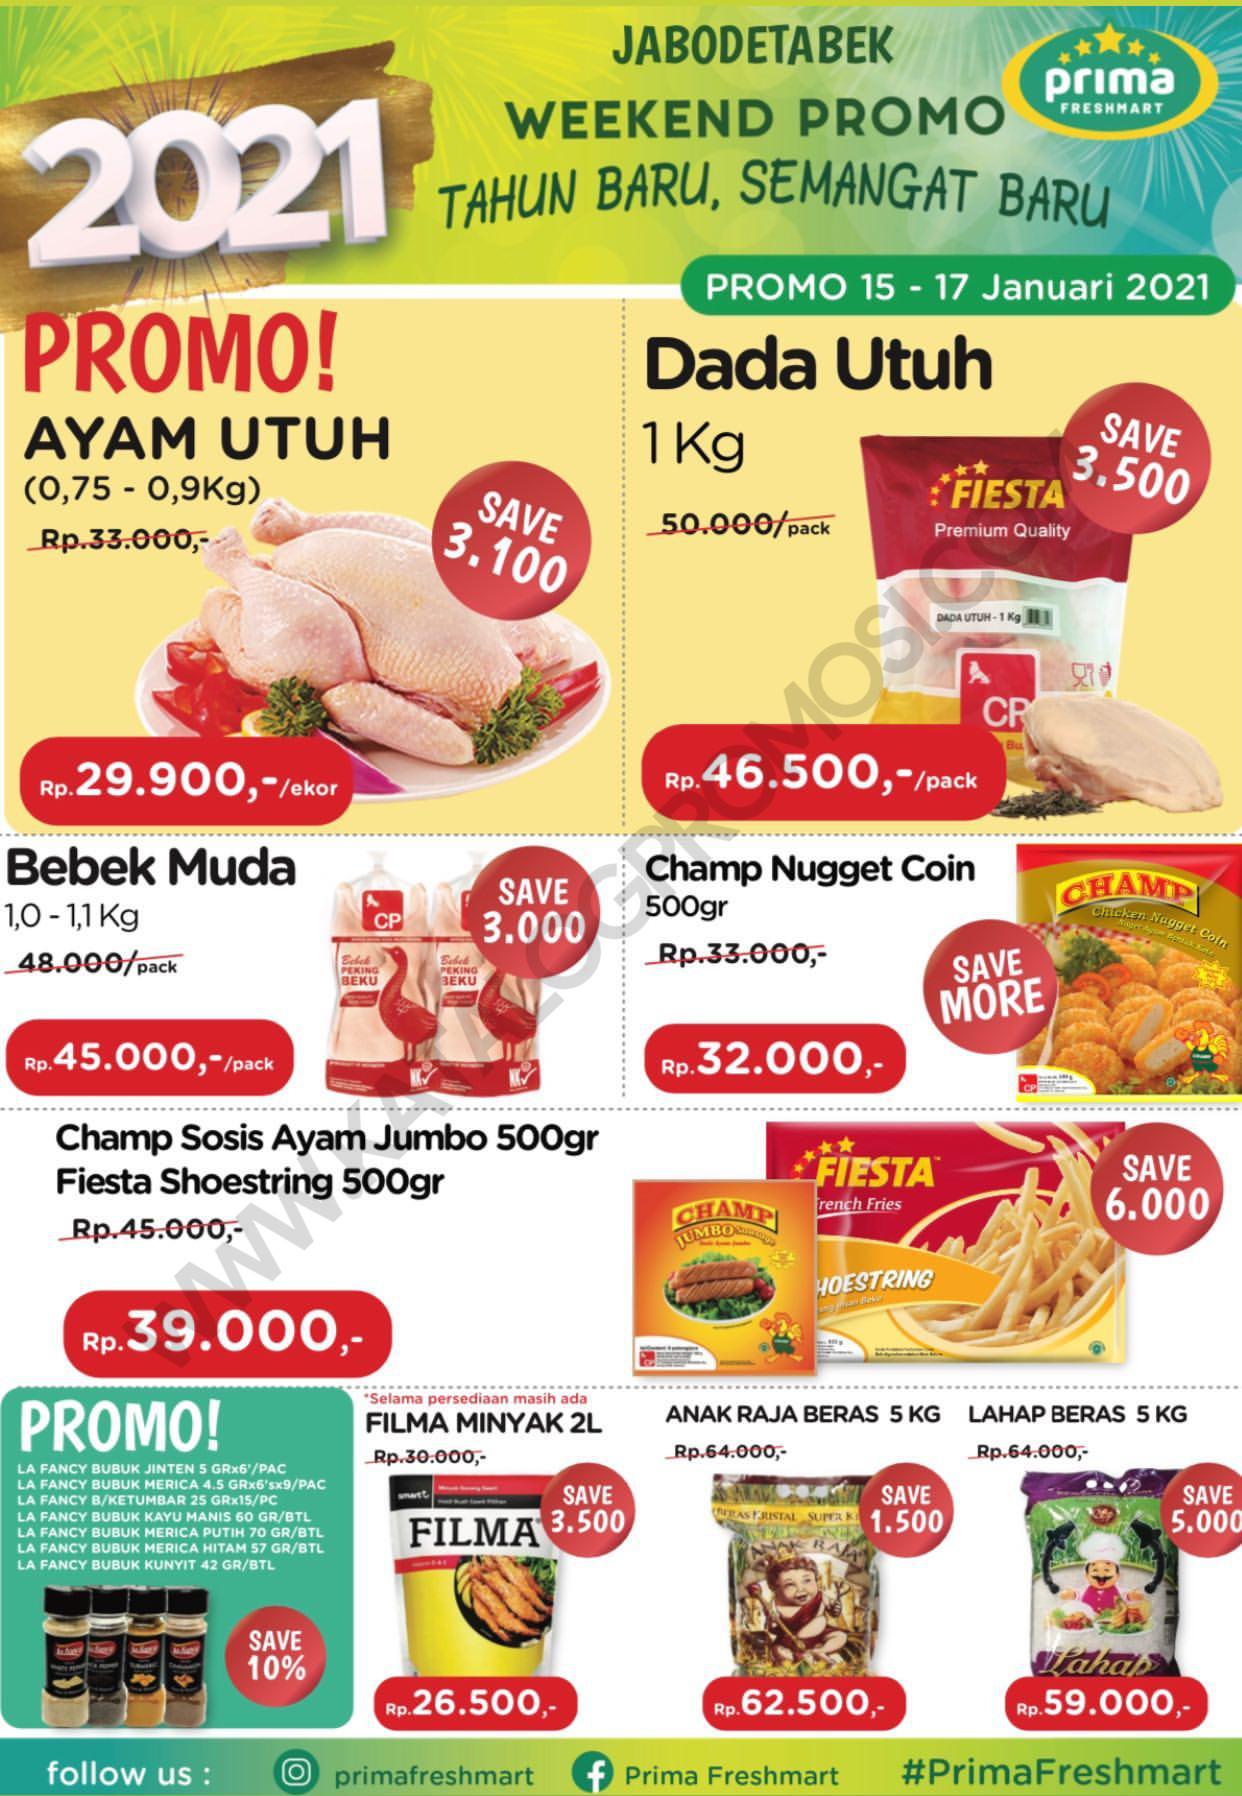 Promo Prima Freshmart Terbaru - Katalog Belanja Weekend JSM periode 15-17 Januari 2021